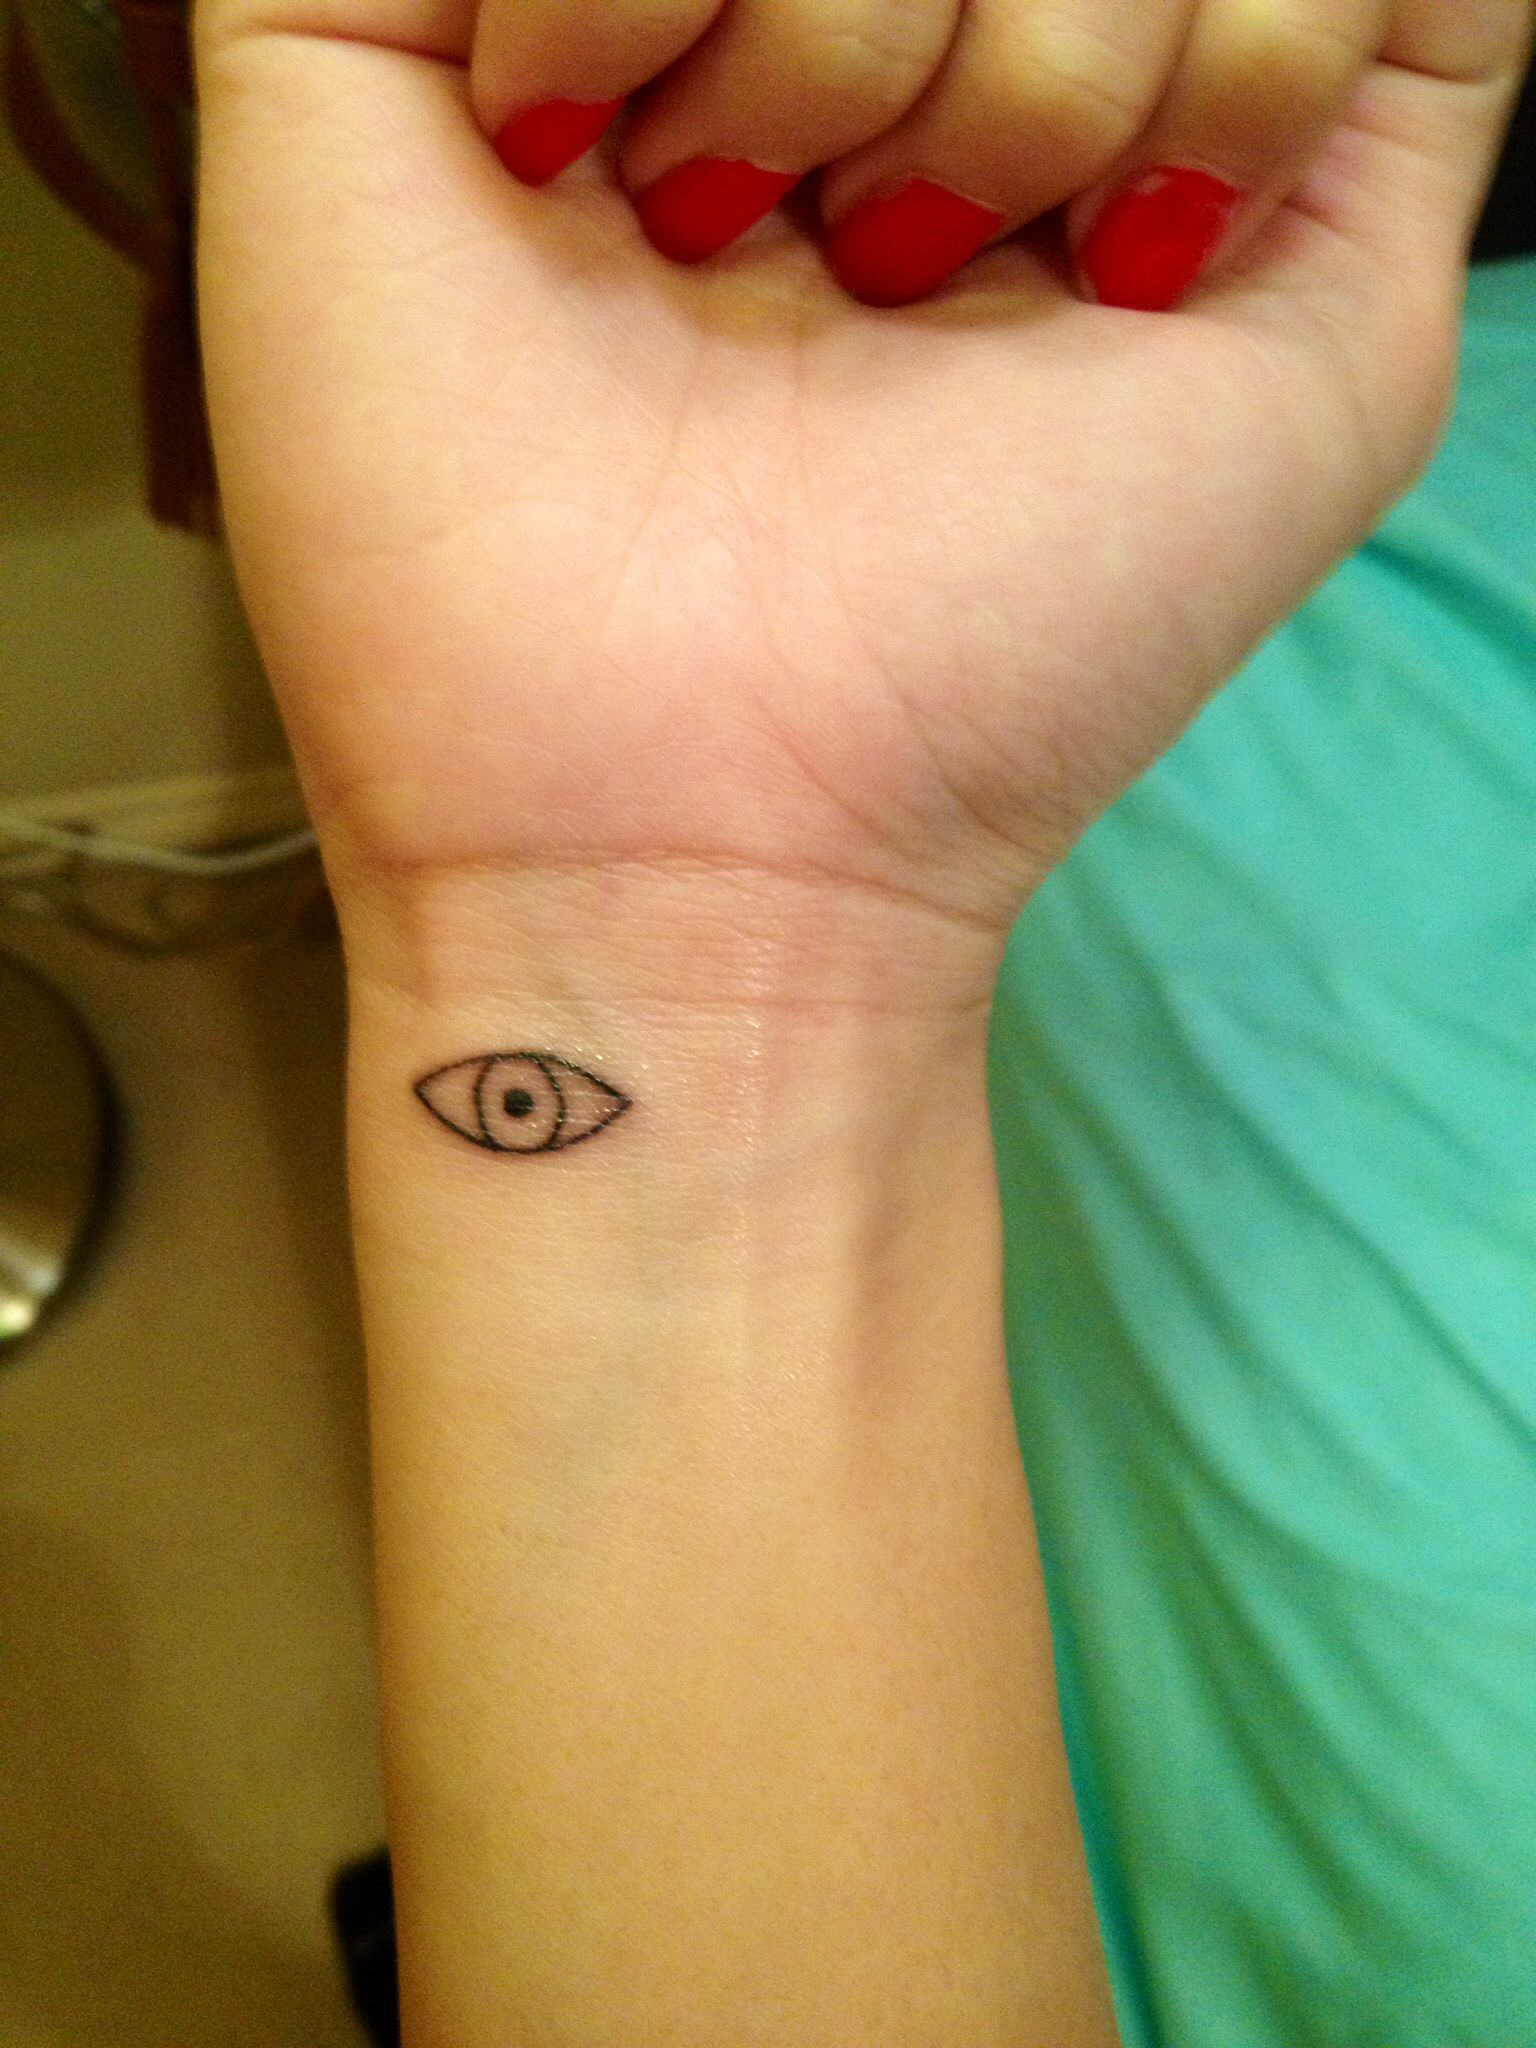 Evil Eye Tattoo (With images) Evil eye tattoo, Wrist